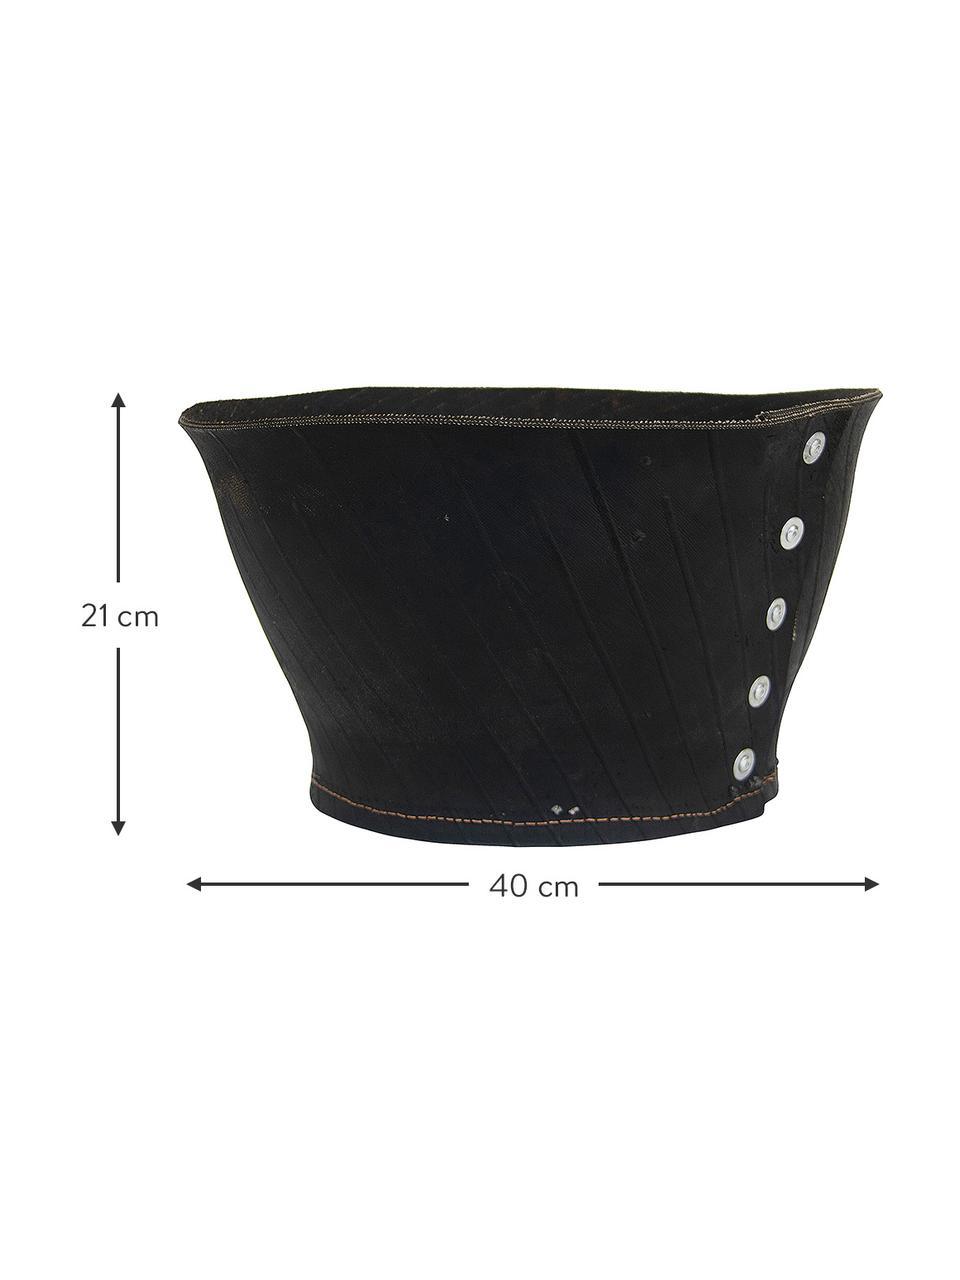 Großer handgefertigter Übertopf Reuse, Gummi, recycelt, Schwarz, 40 x 21 cm